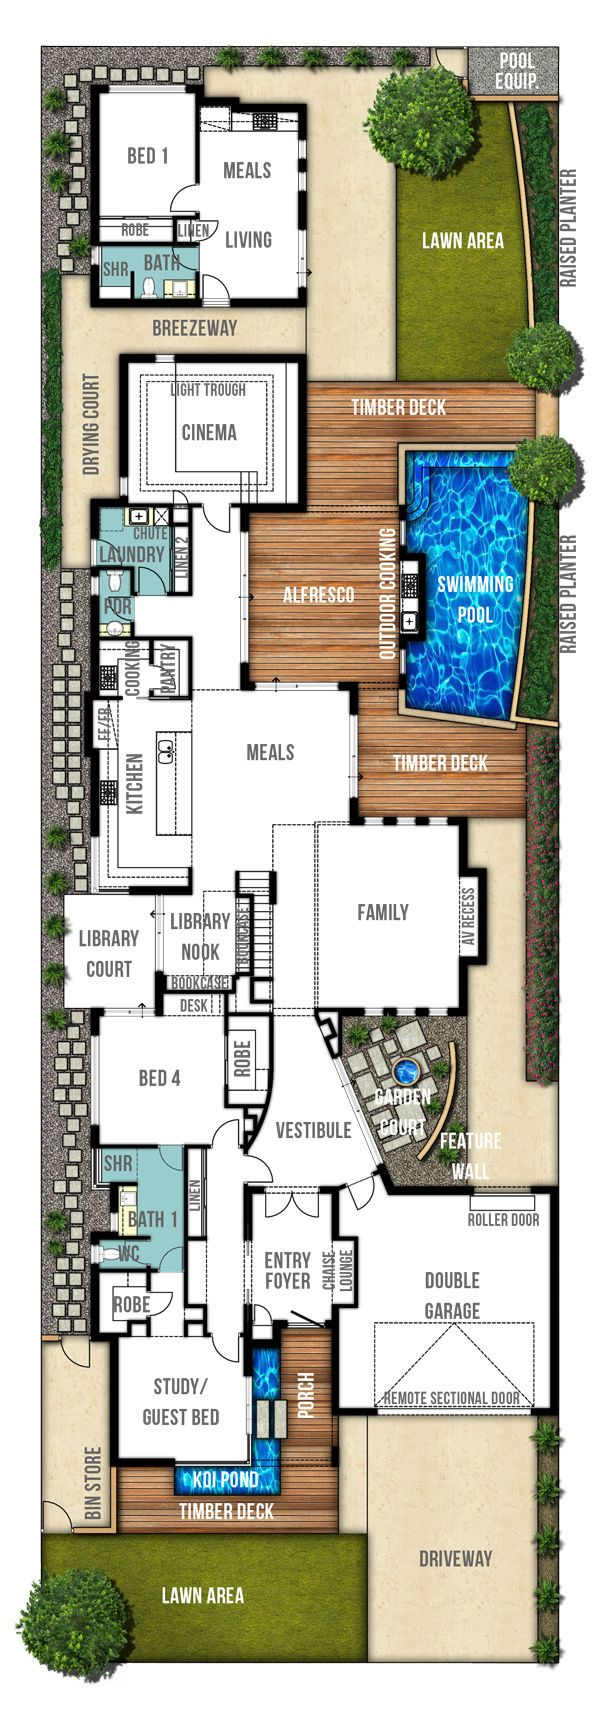 two storey home plans - ground floor design | Floor plans ...